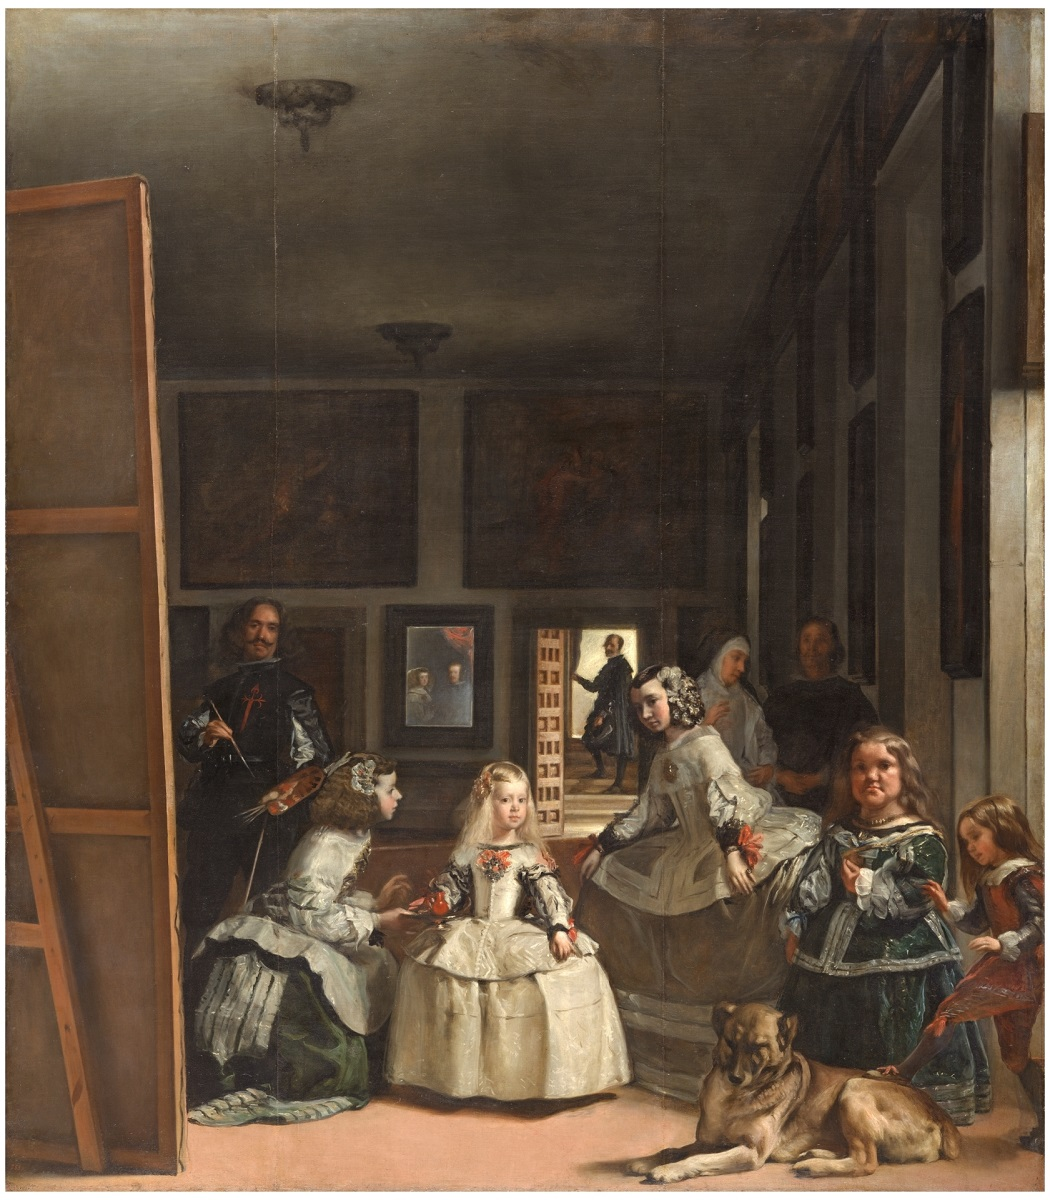 Tableau Las Meninas de Velazquez exposé au Musée du Prado de Madrid